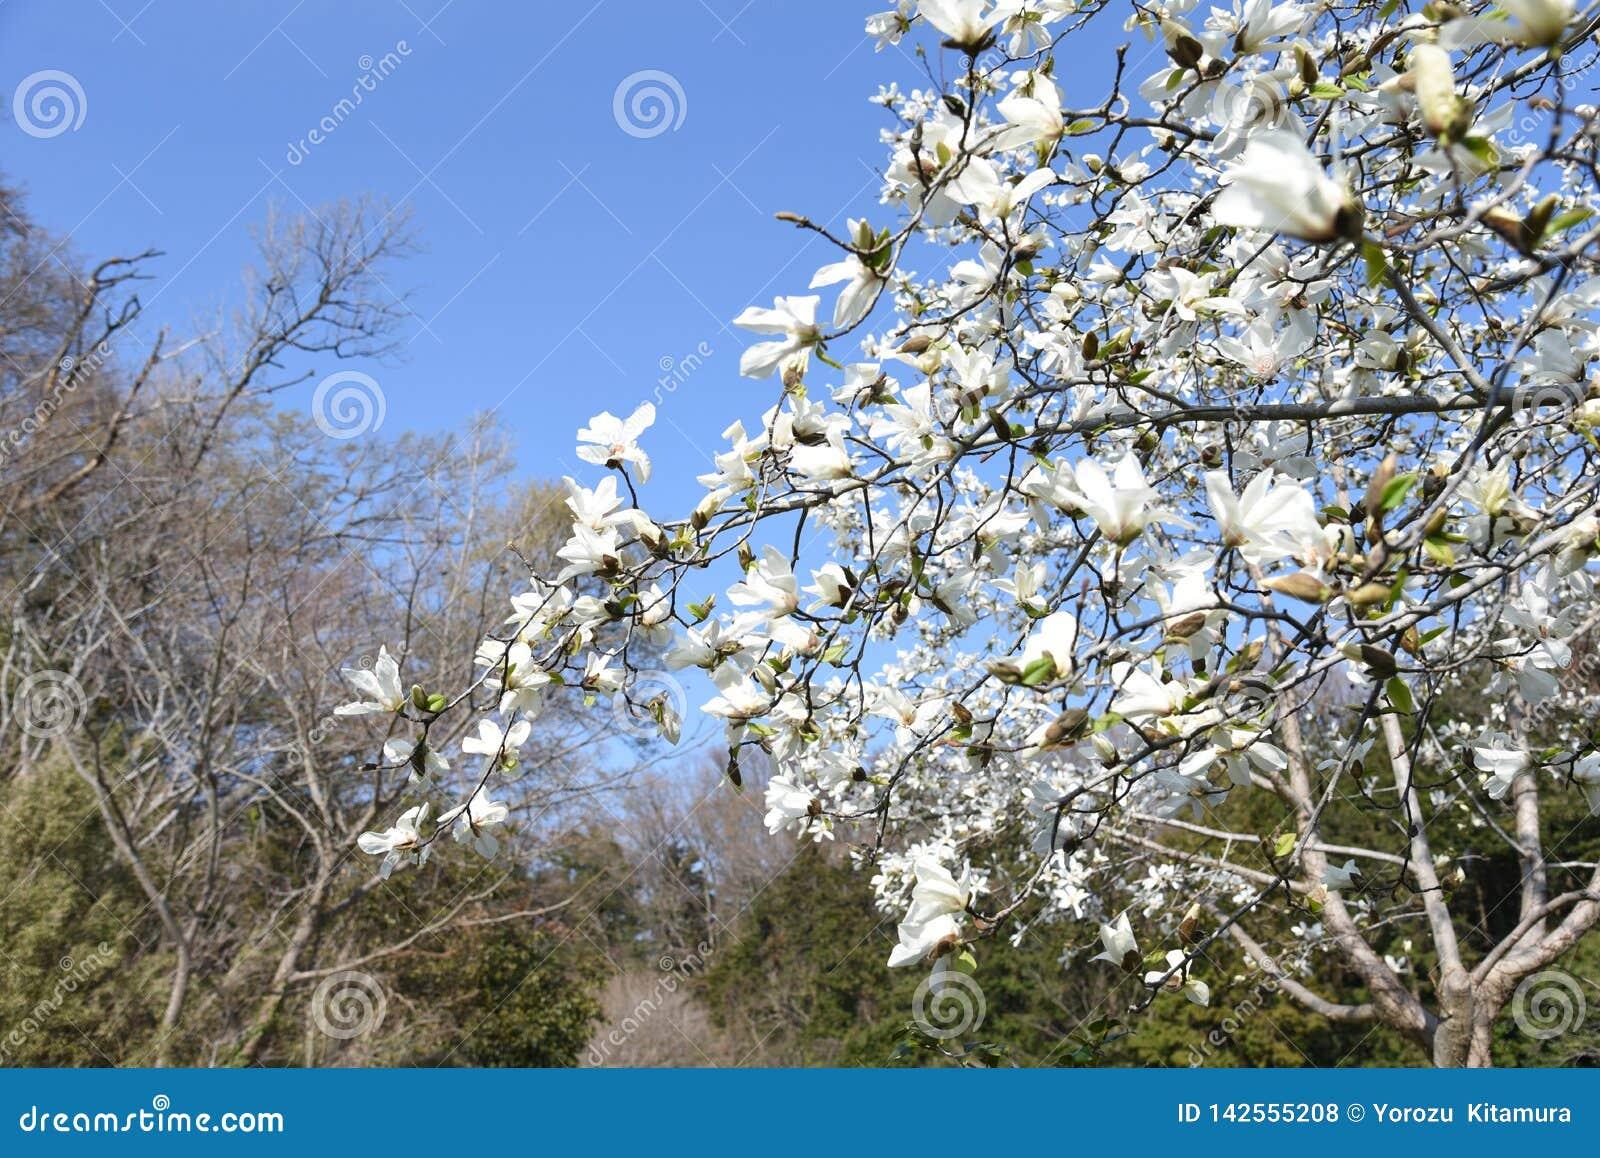 Magnolia kobus blossoms